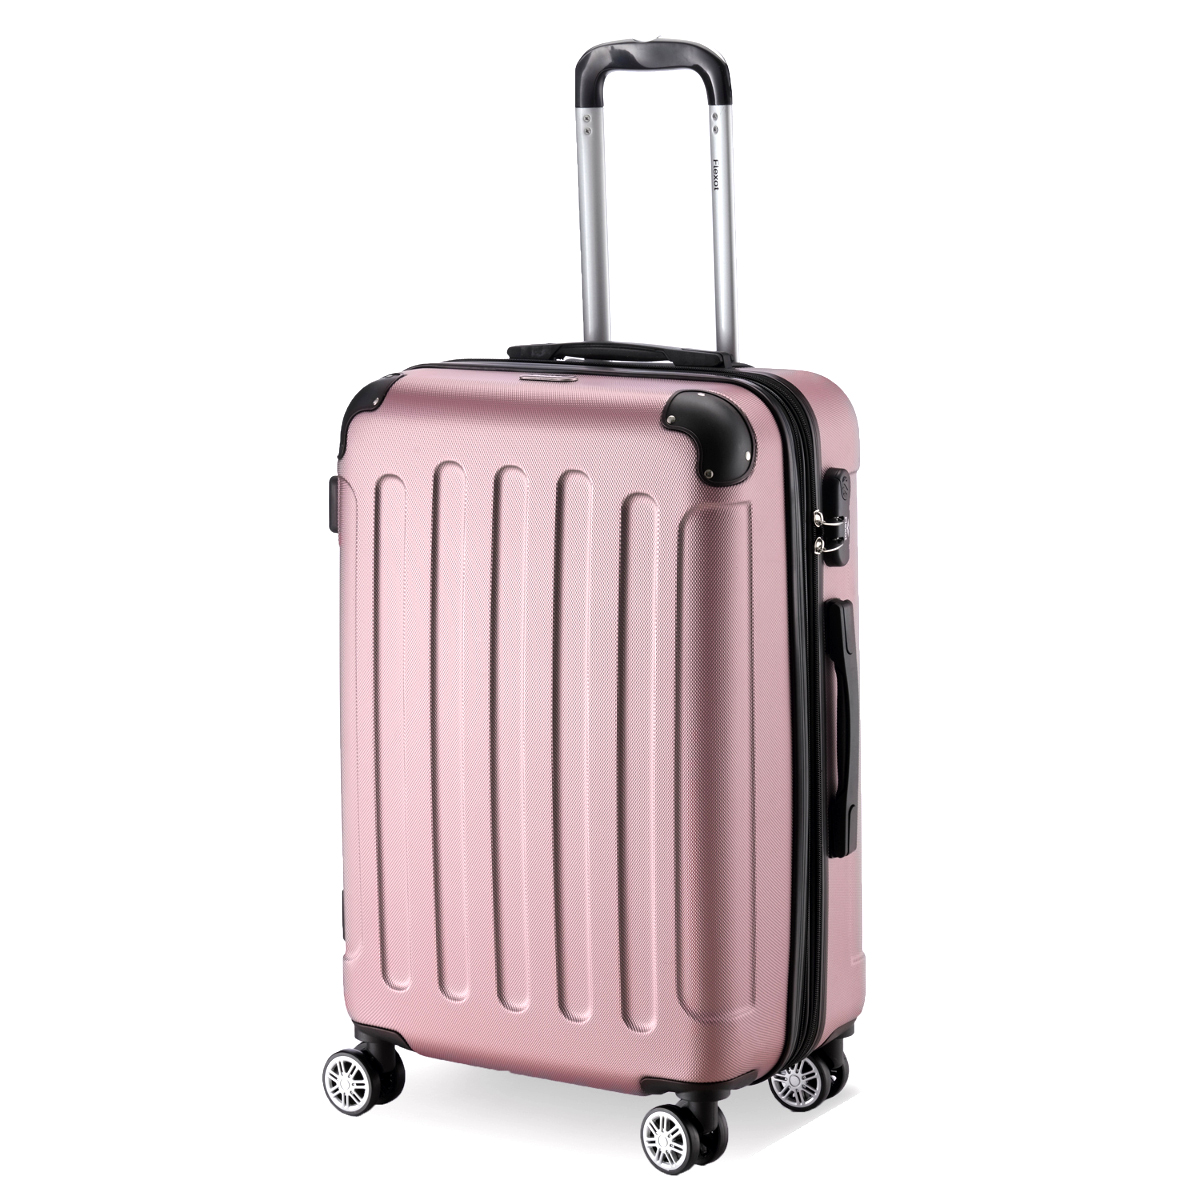 Koffer-Flexot-2045-Hartschalenkoffer-Trolley-Kofferset-Reisekoffer-M-L-XL-Set Indexbild 23